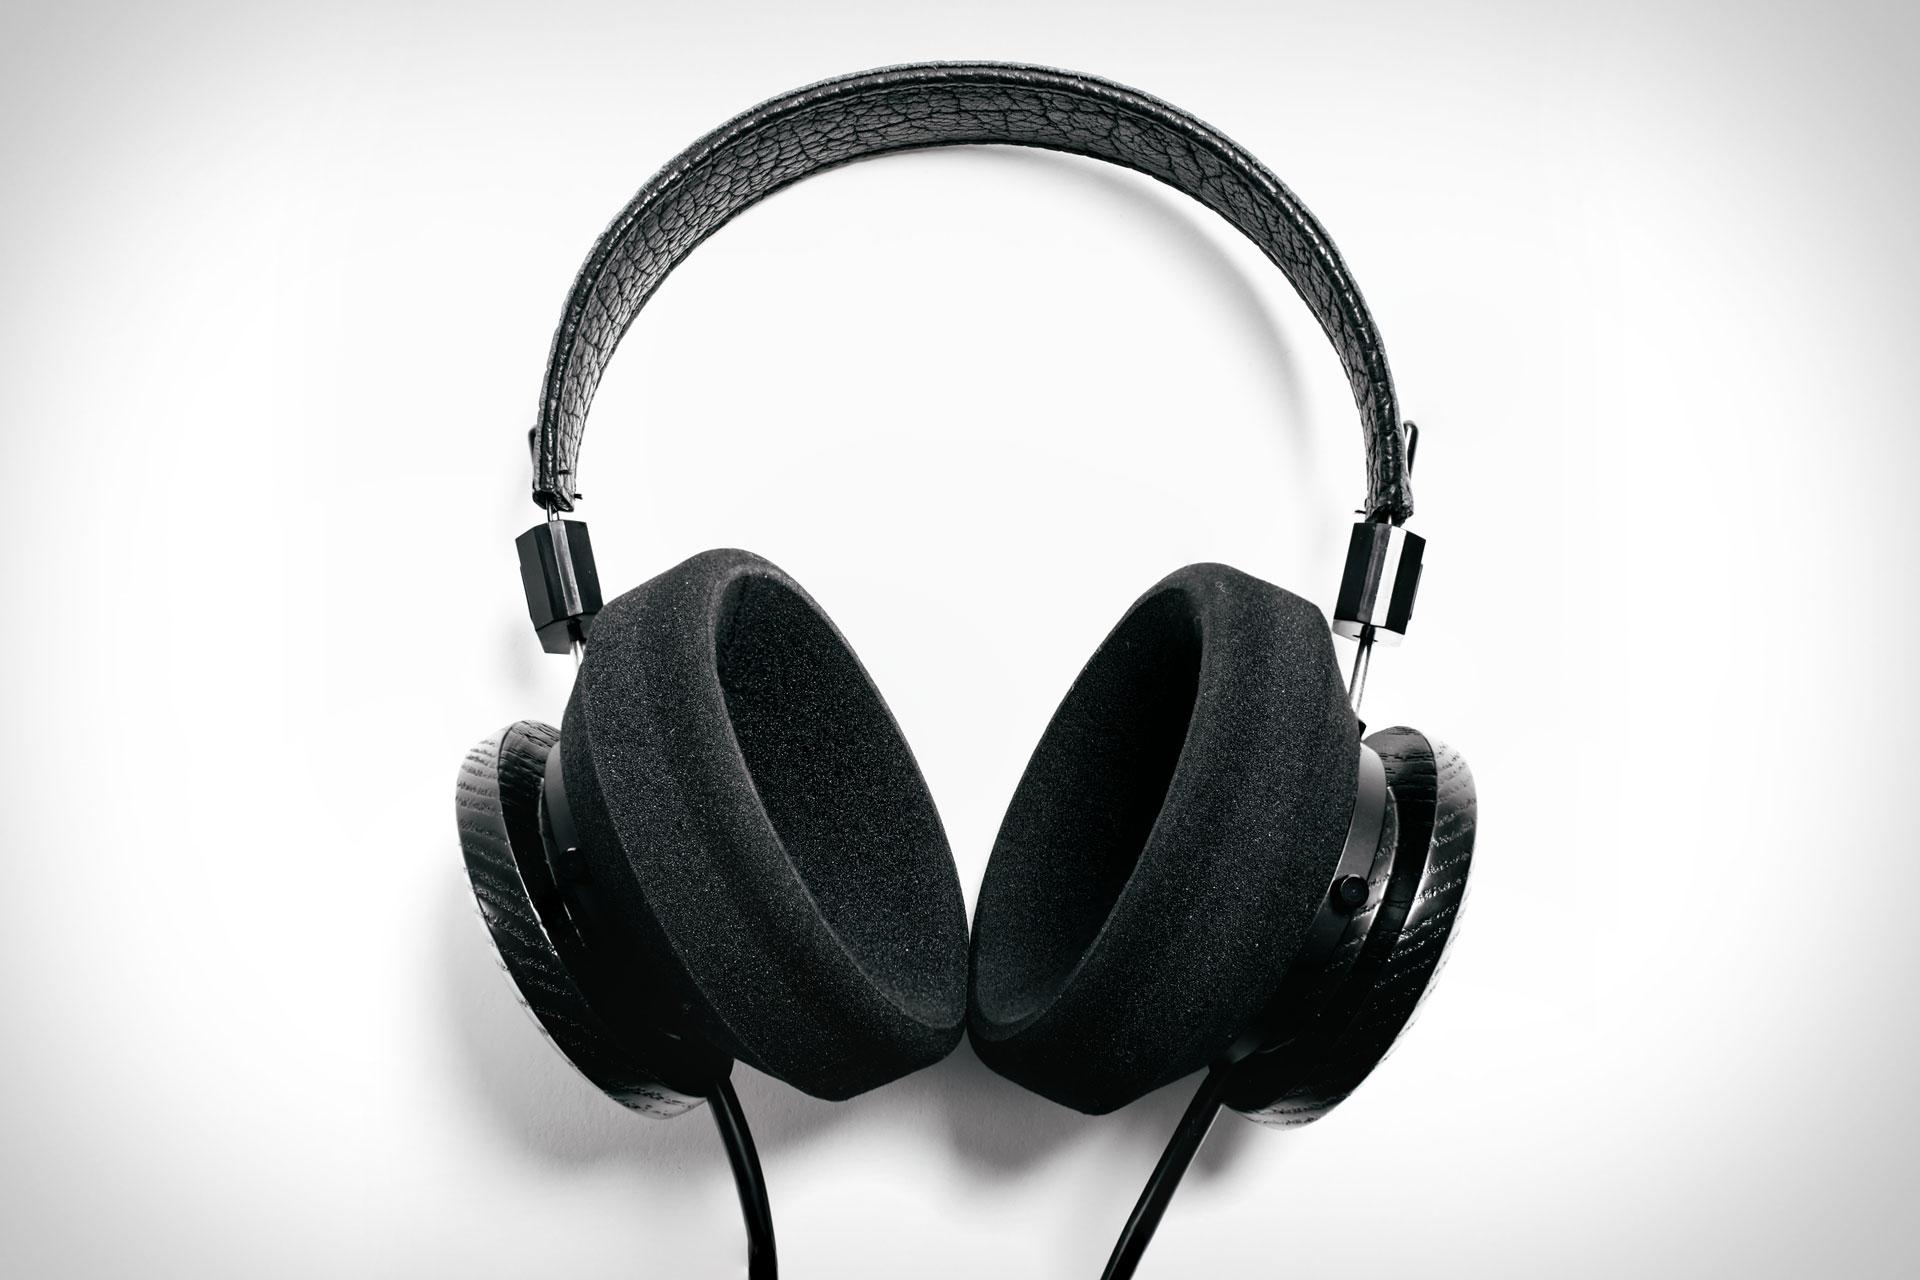 Grado x Uncrate GS2000e Headphones